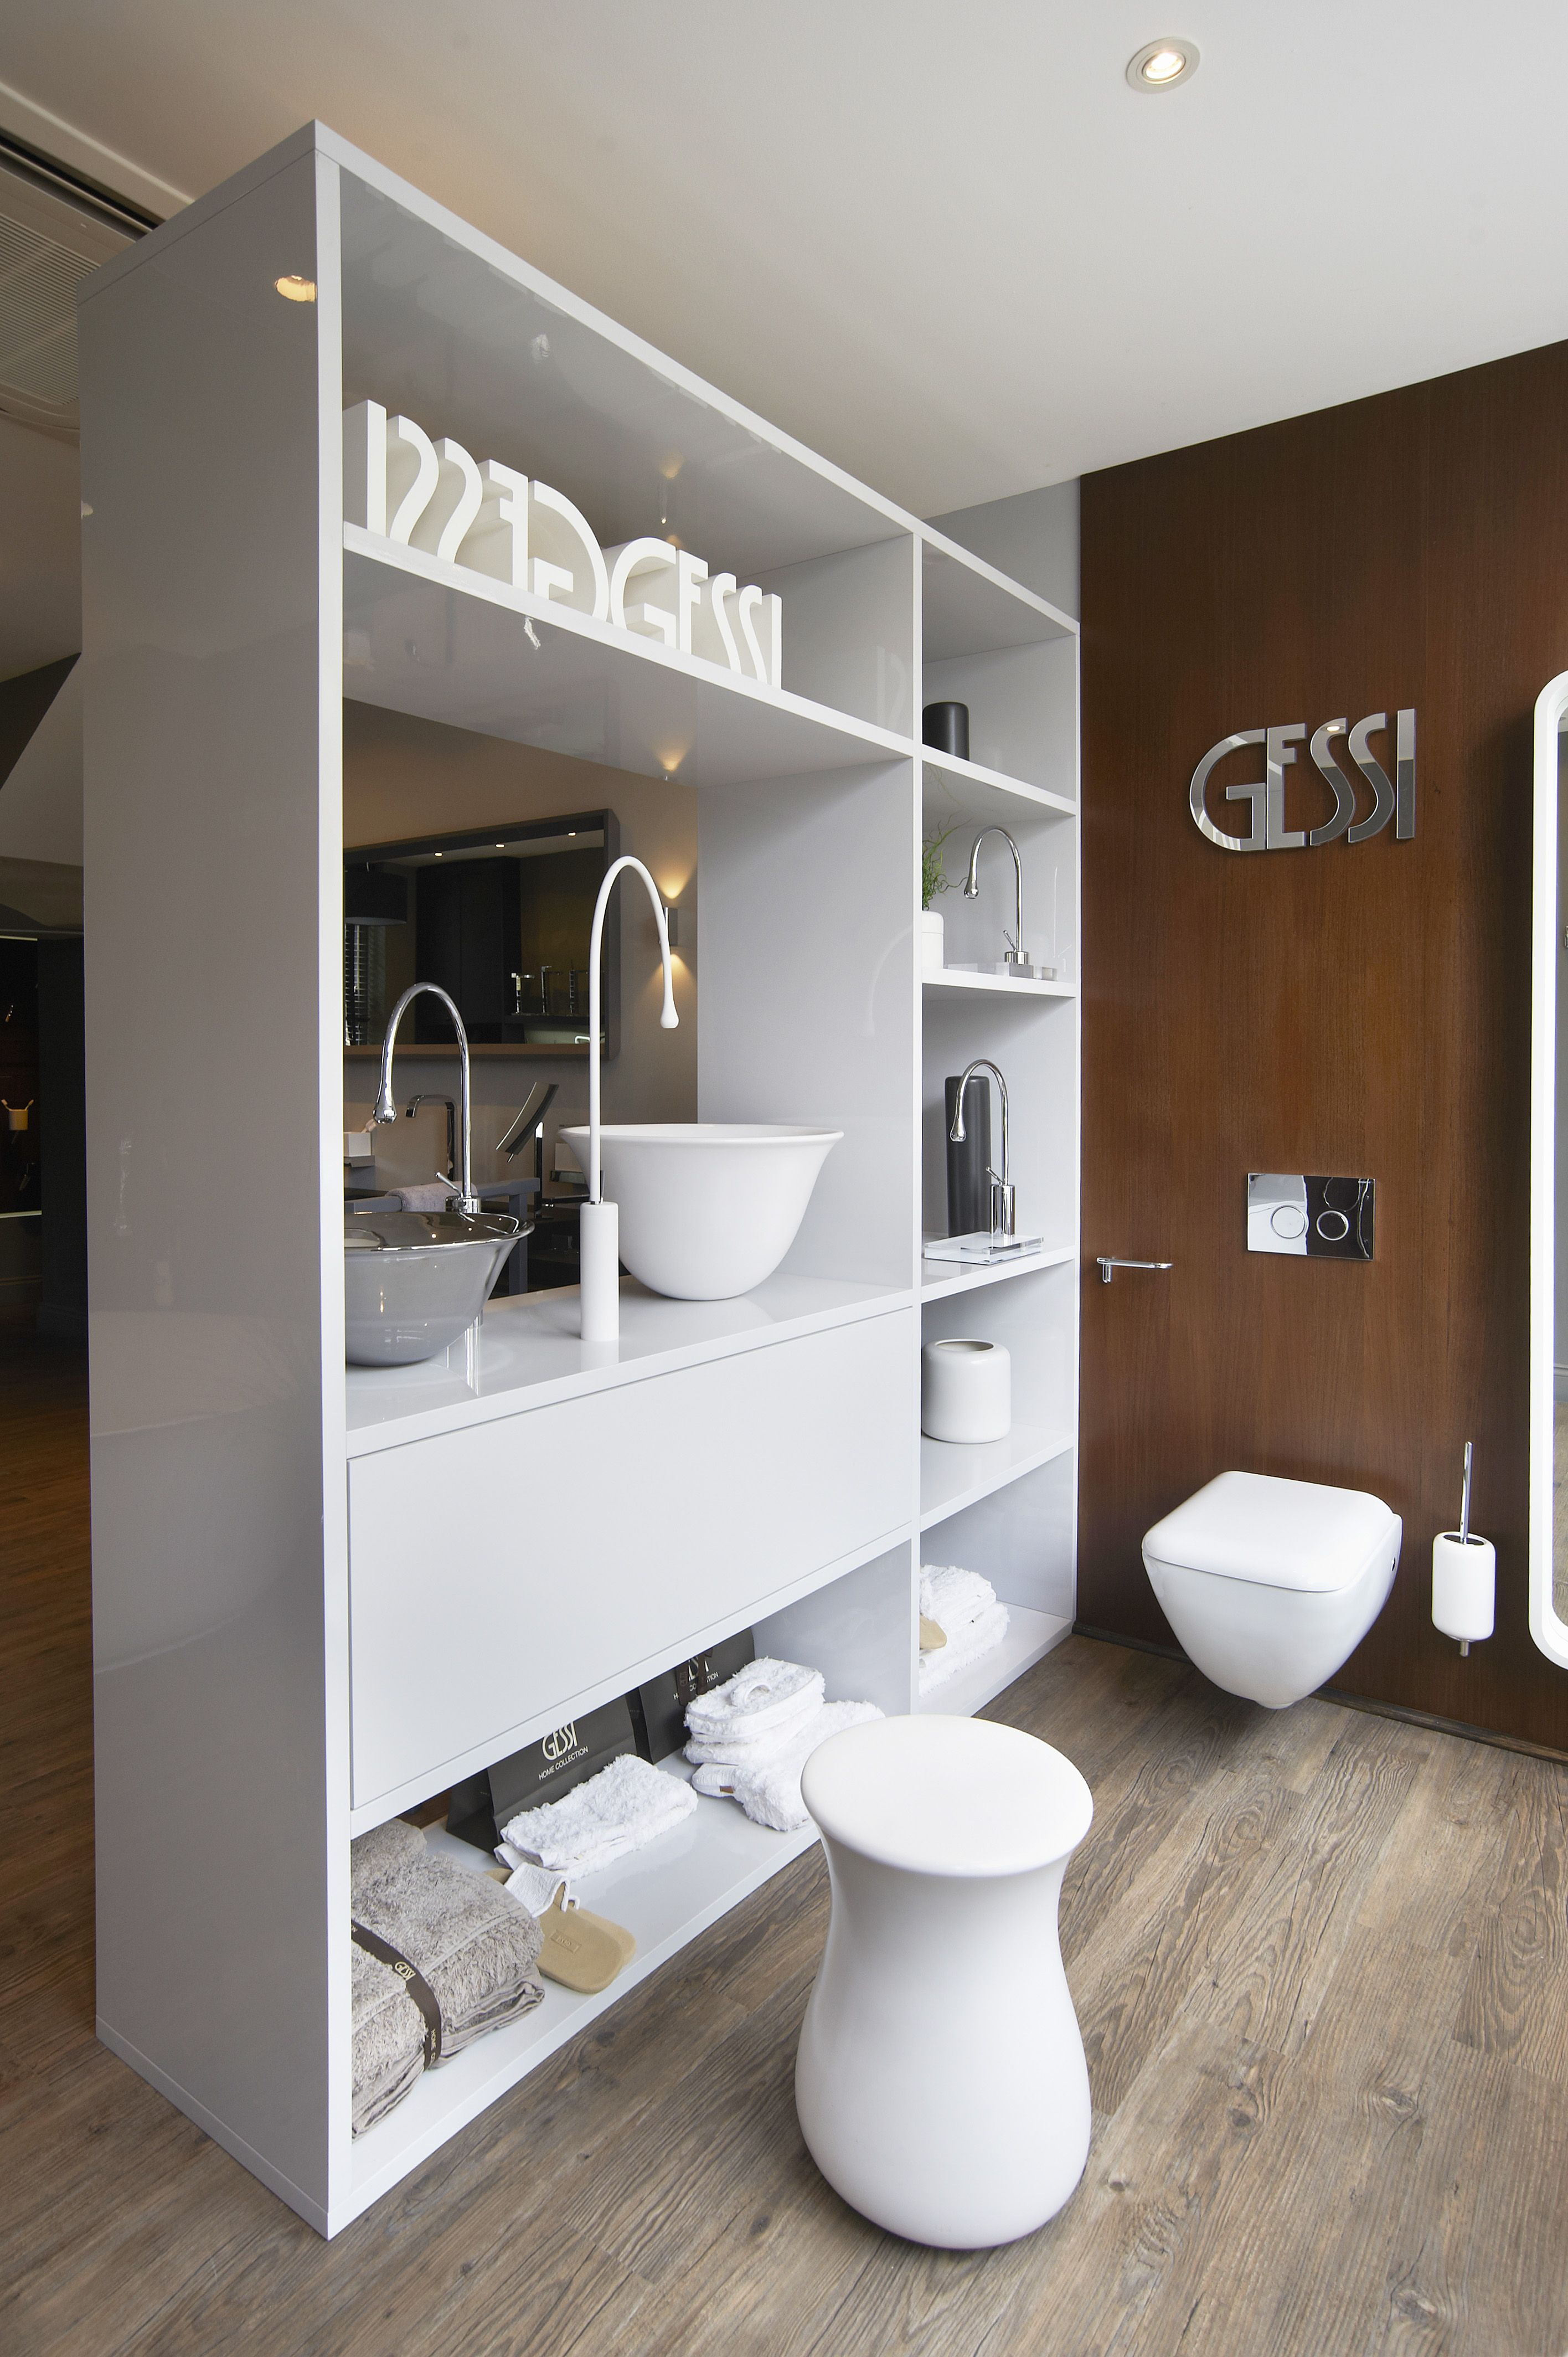 c p hart s studio italiano bathroom showroom london sanitary rh pinterest com